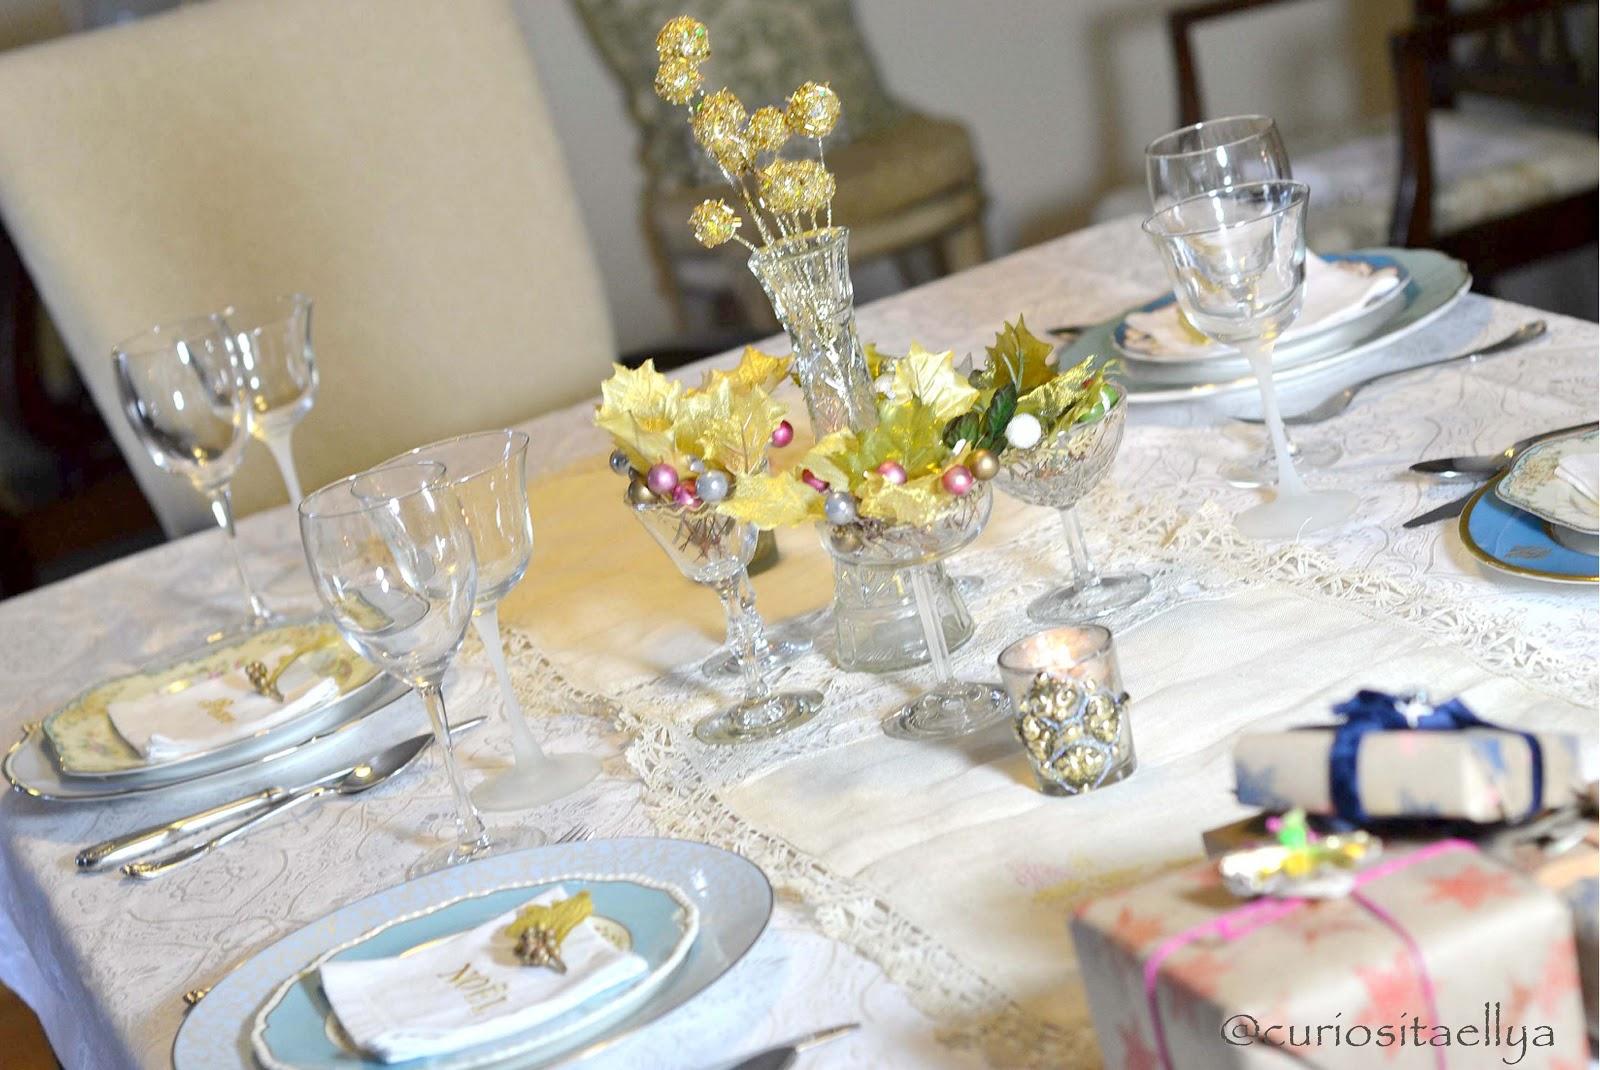 Curiositaellya Christmas Dinner Table Setting With Gold